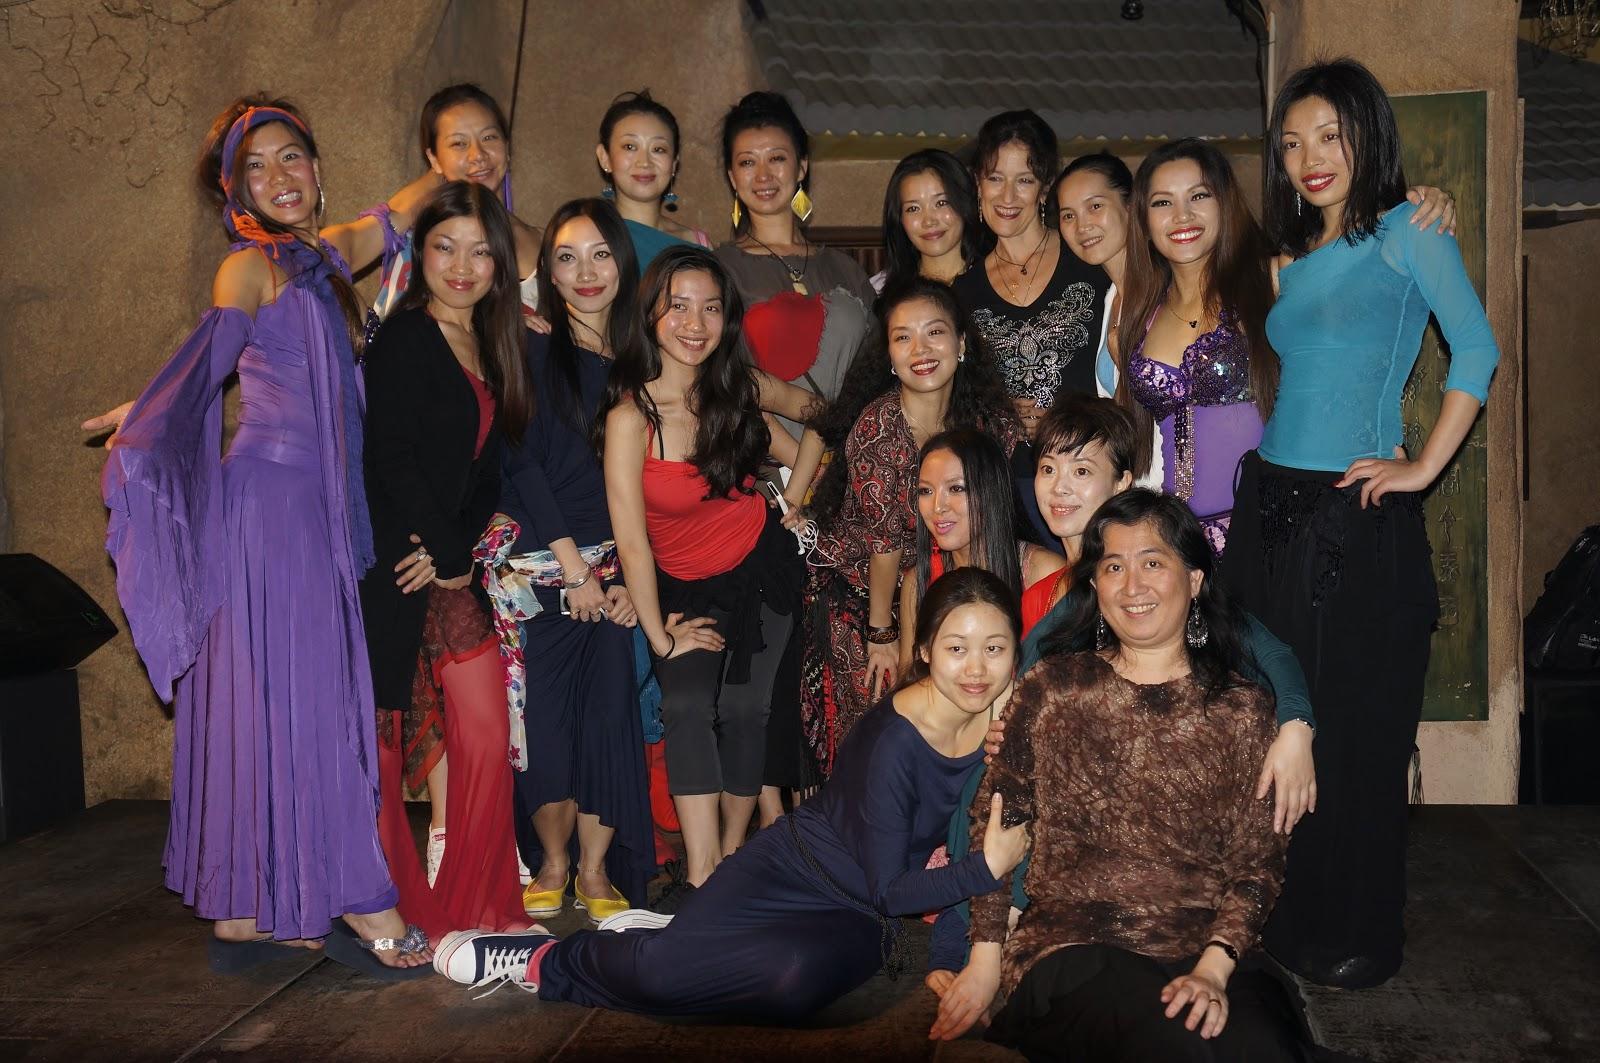 Month Long Dance Bootcamp with Master Dance Teacher Tamalyn Dallah- Solo Dance Rehearsal Day at Mural Bar (Shanghai)